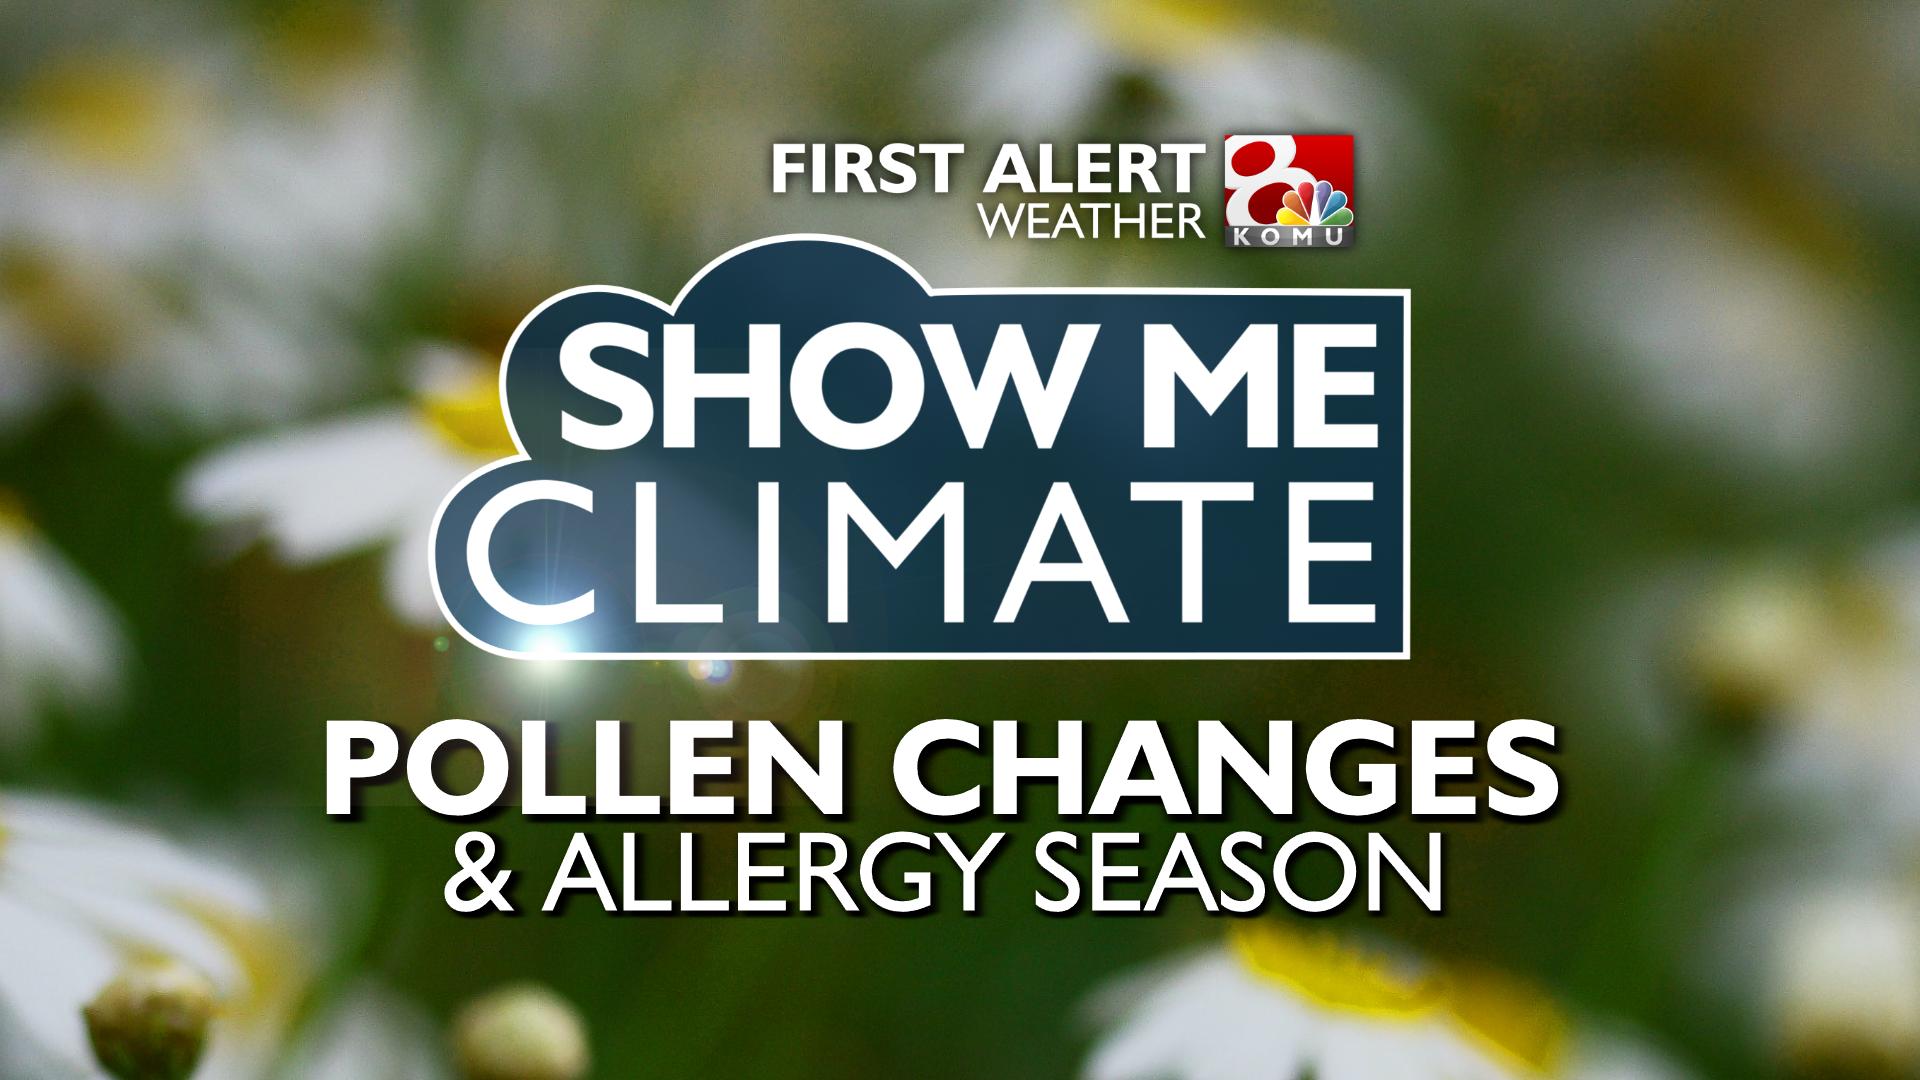 As temperatures rise, so do allergies